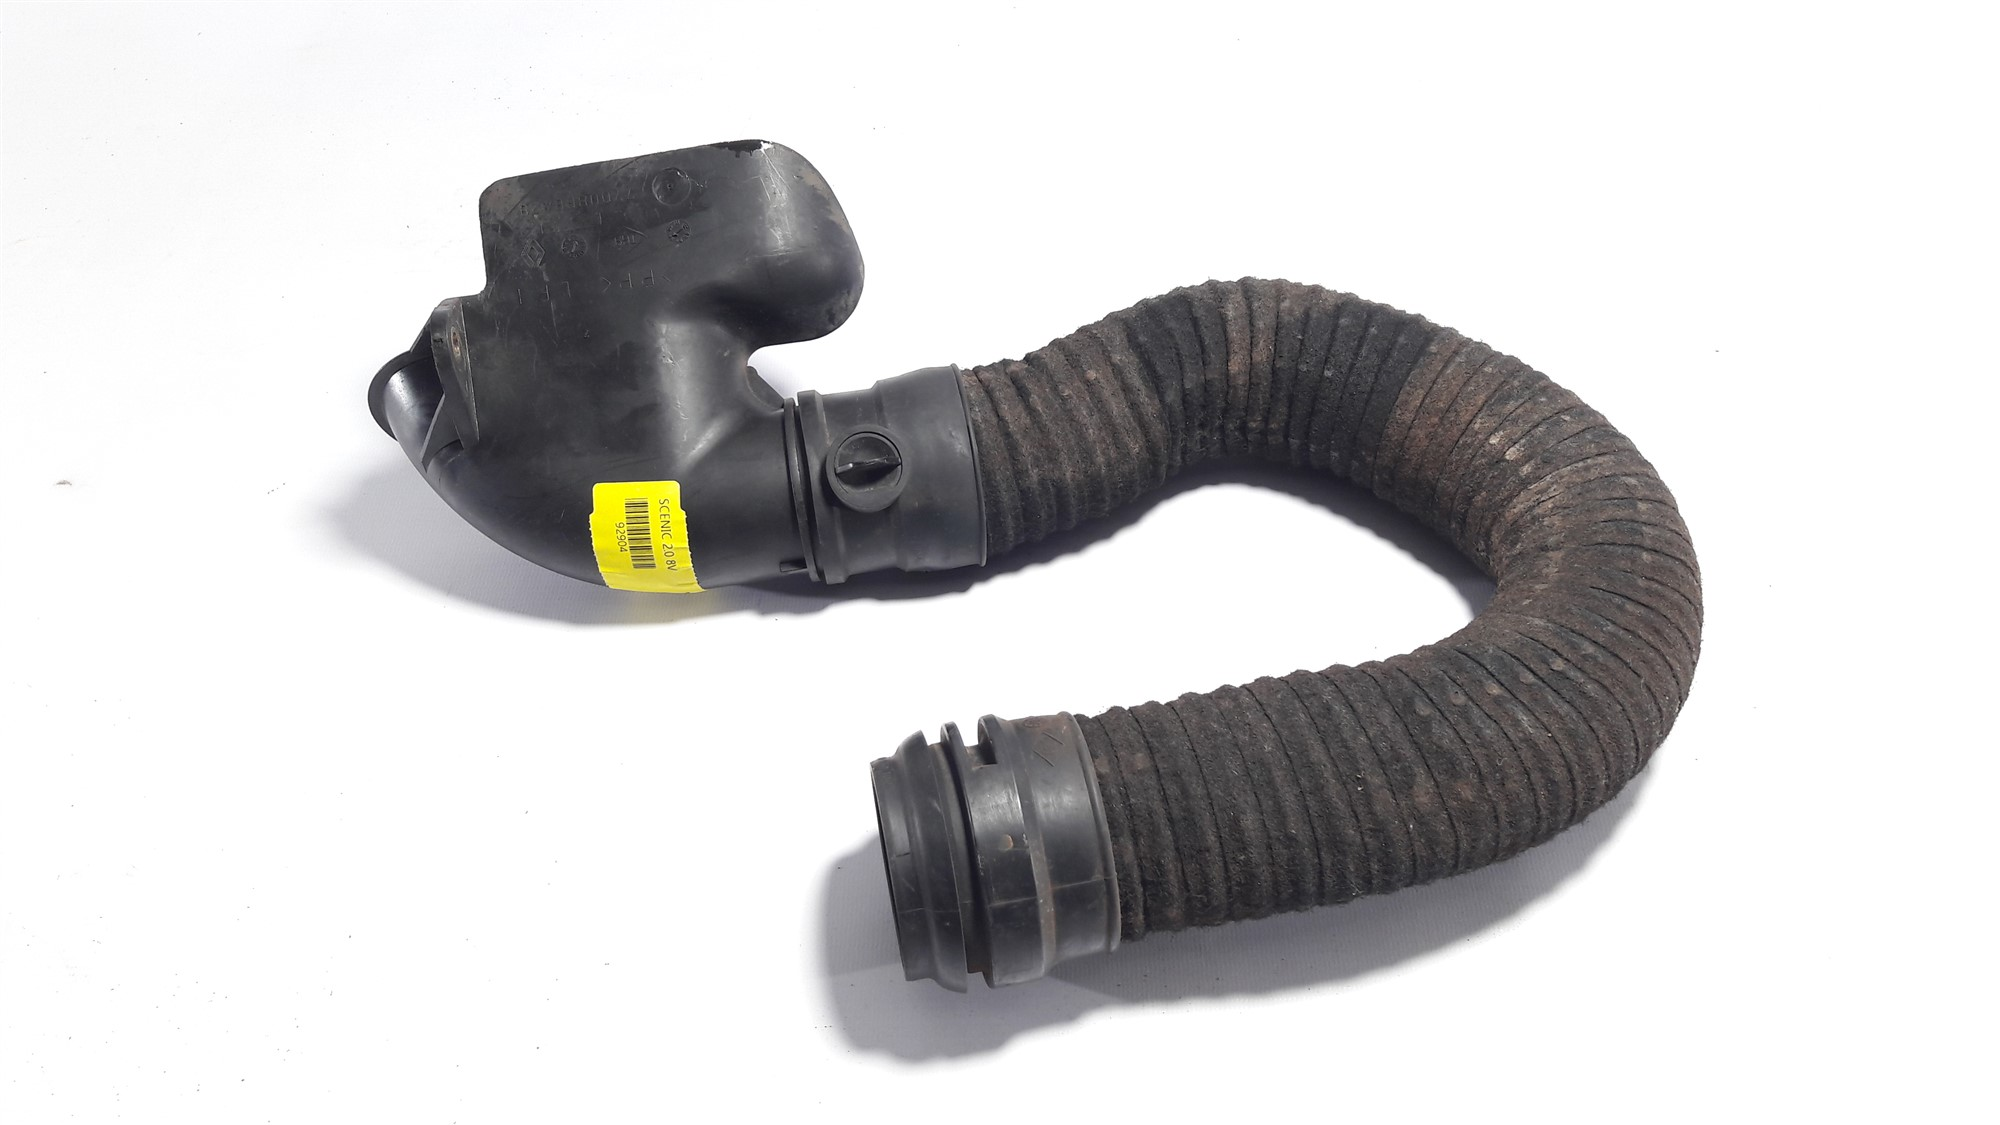 DUTO TUBO ENTRADA DE AR 2.0 8V RENAULT SCENIC MEGANE 1996 97 98 99 2000 2001